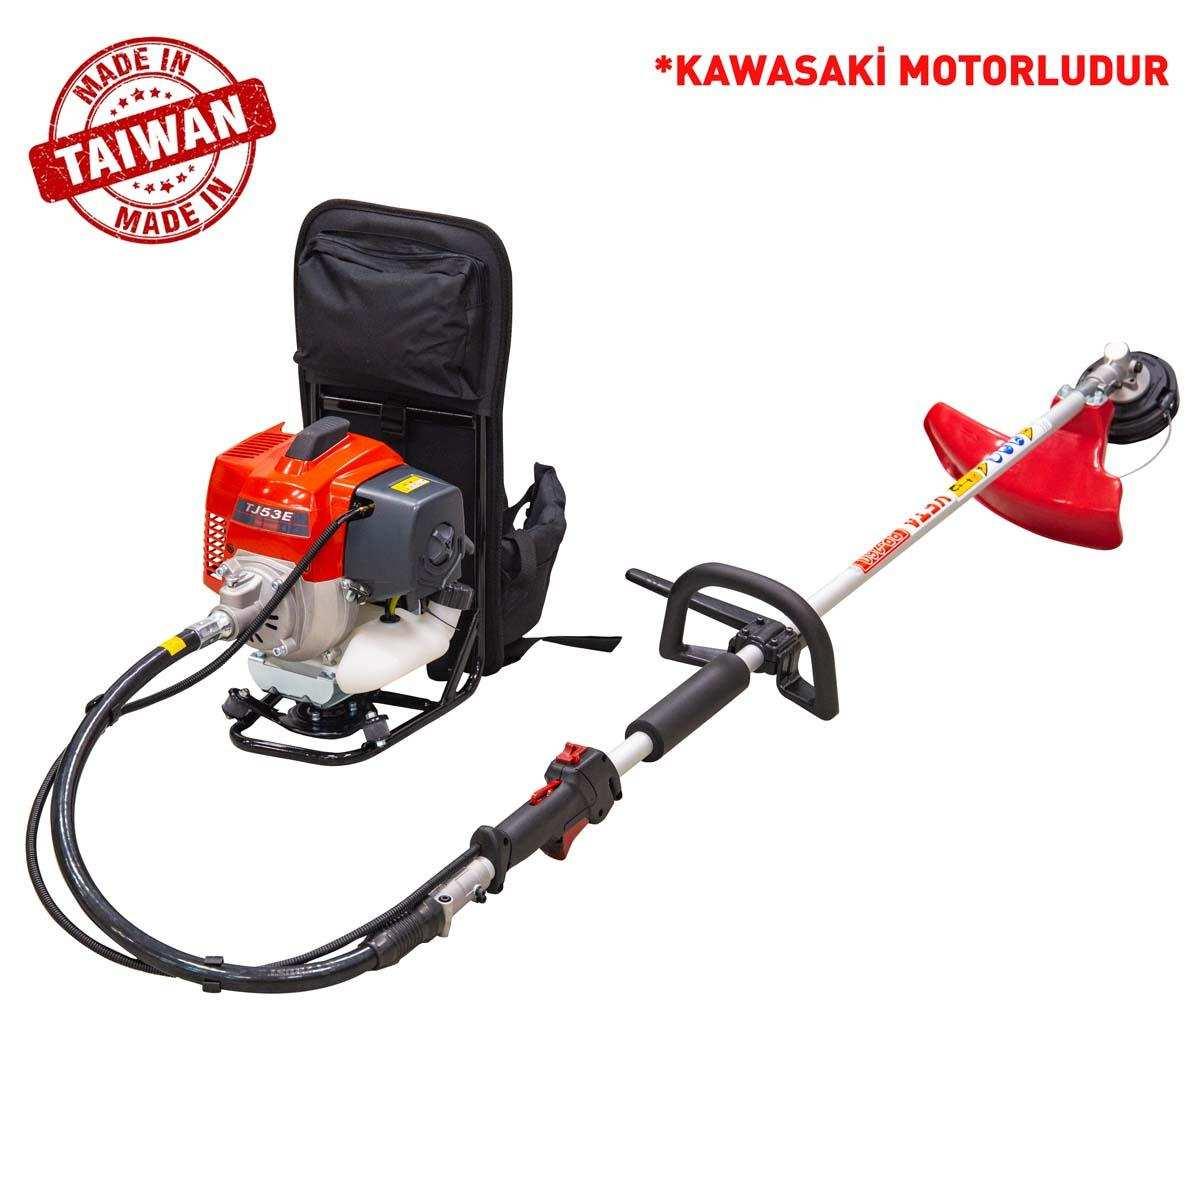 Veta Kawasaki BP-260 Motorlu Sırt Tırpan 2,7 HP